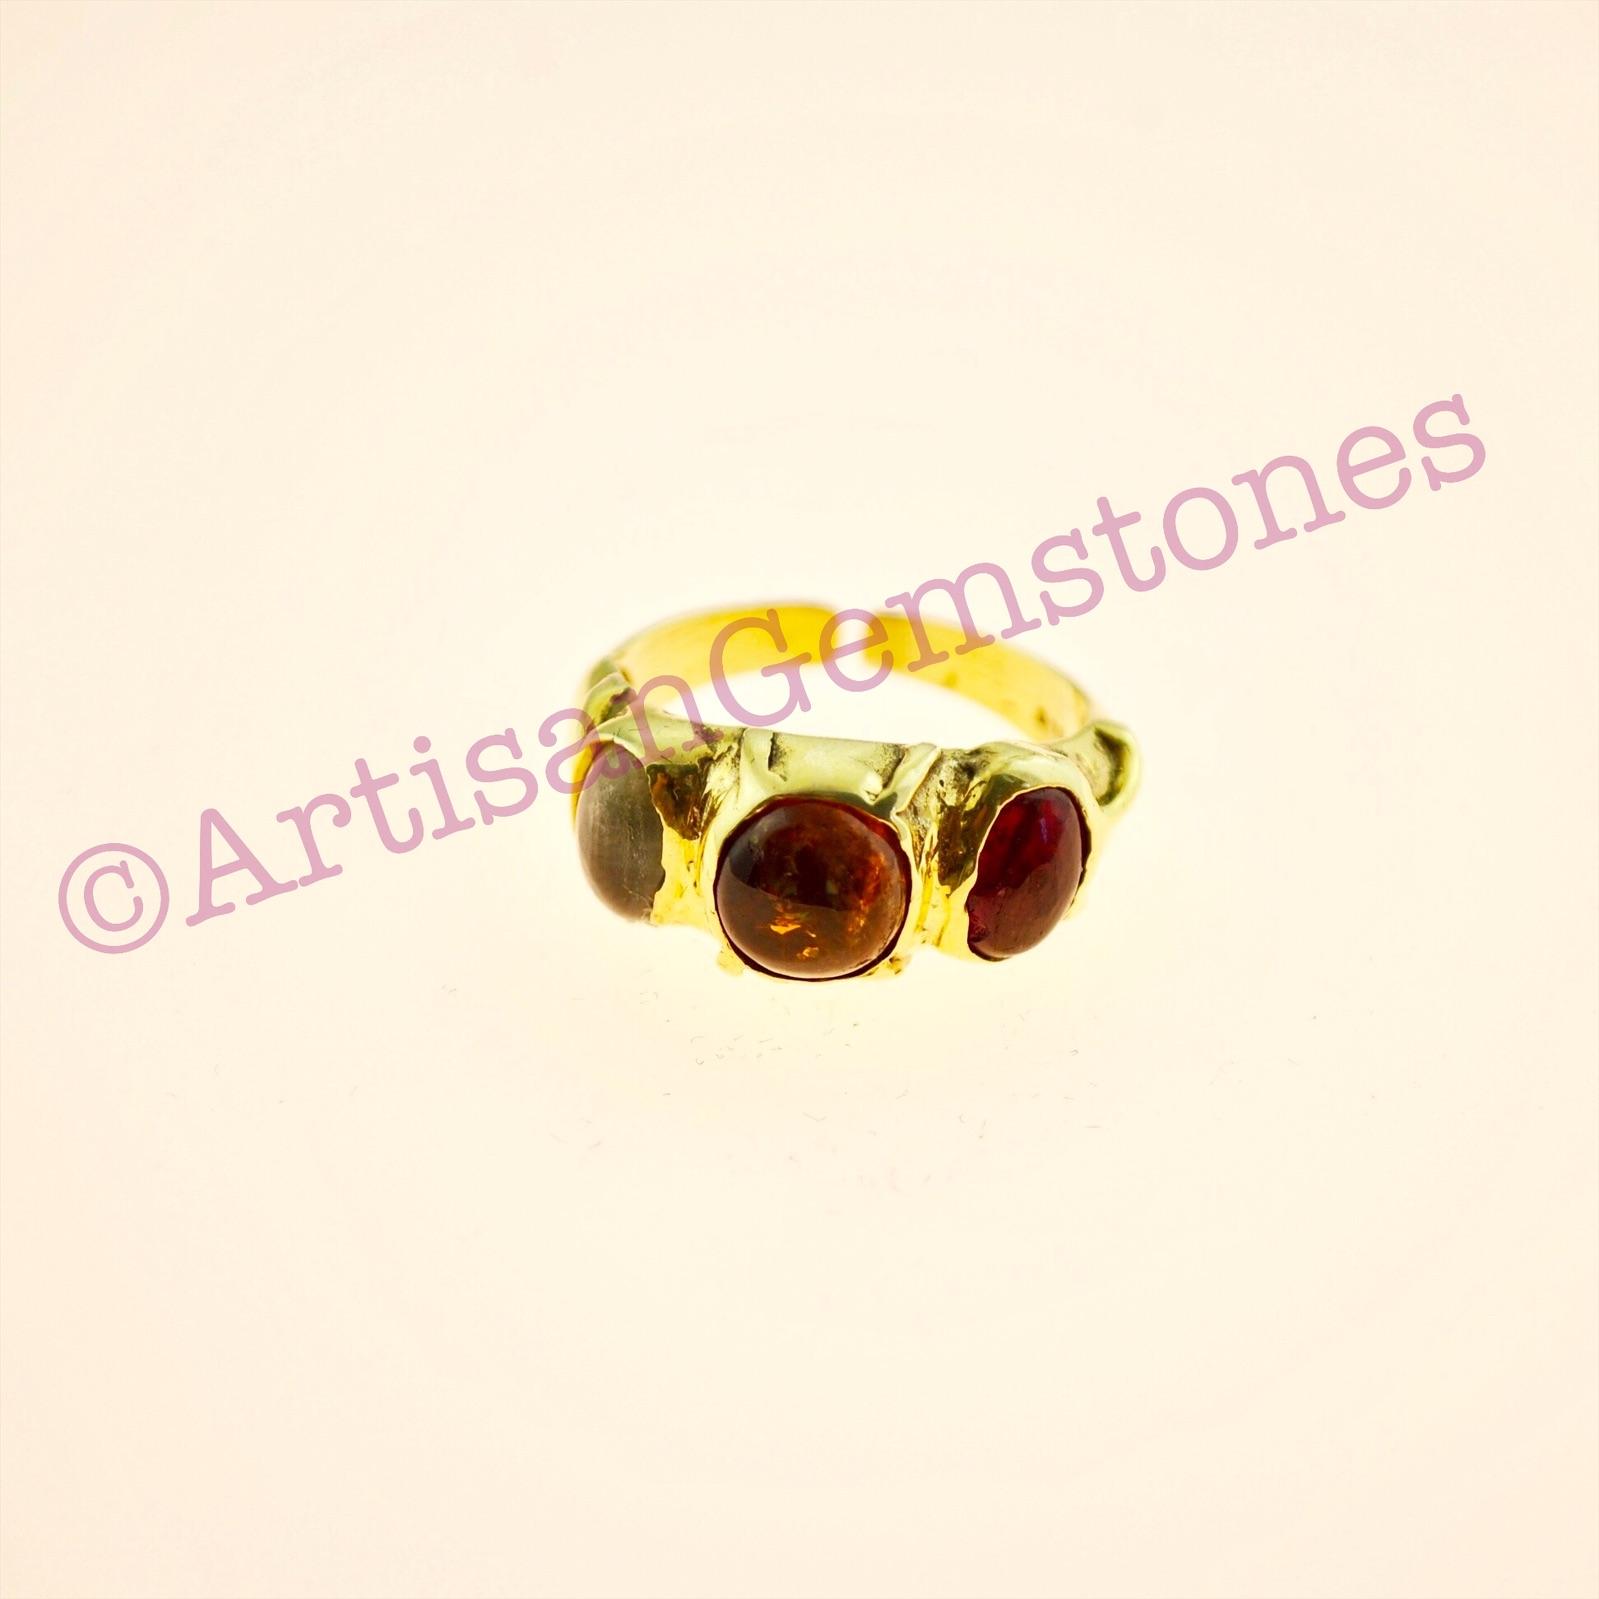 Triple Tourmaline ring in 925 silver 22k Gold vermeil in adjustable size